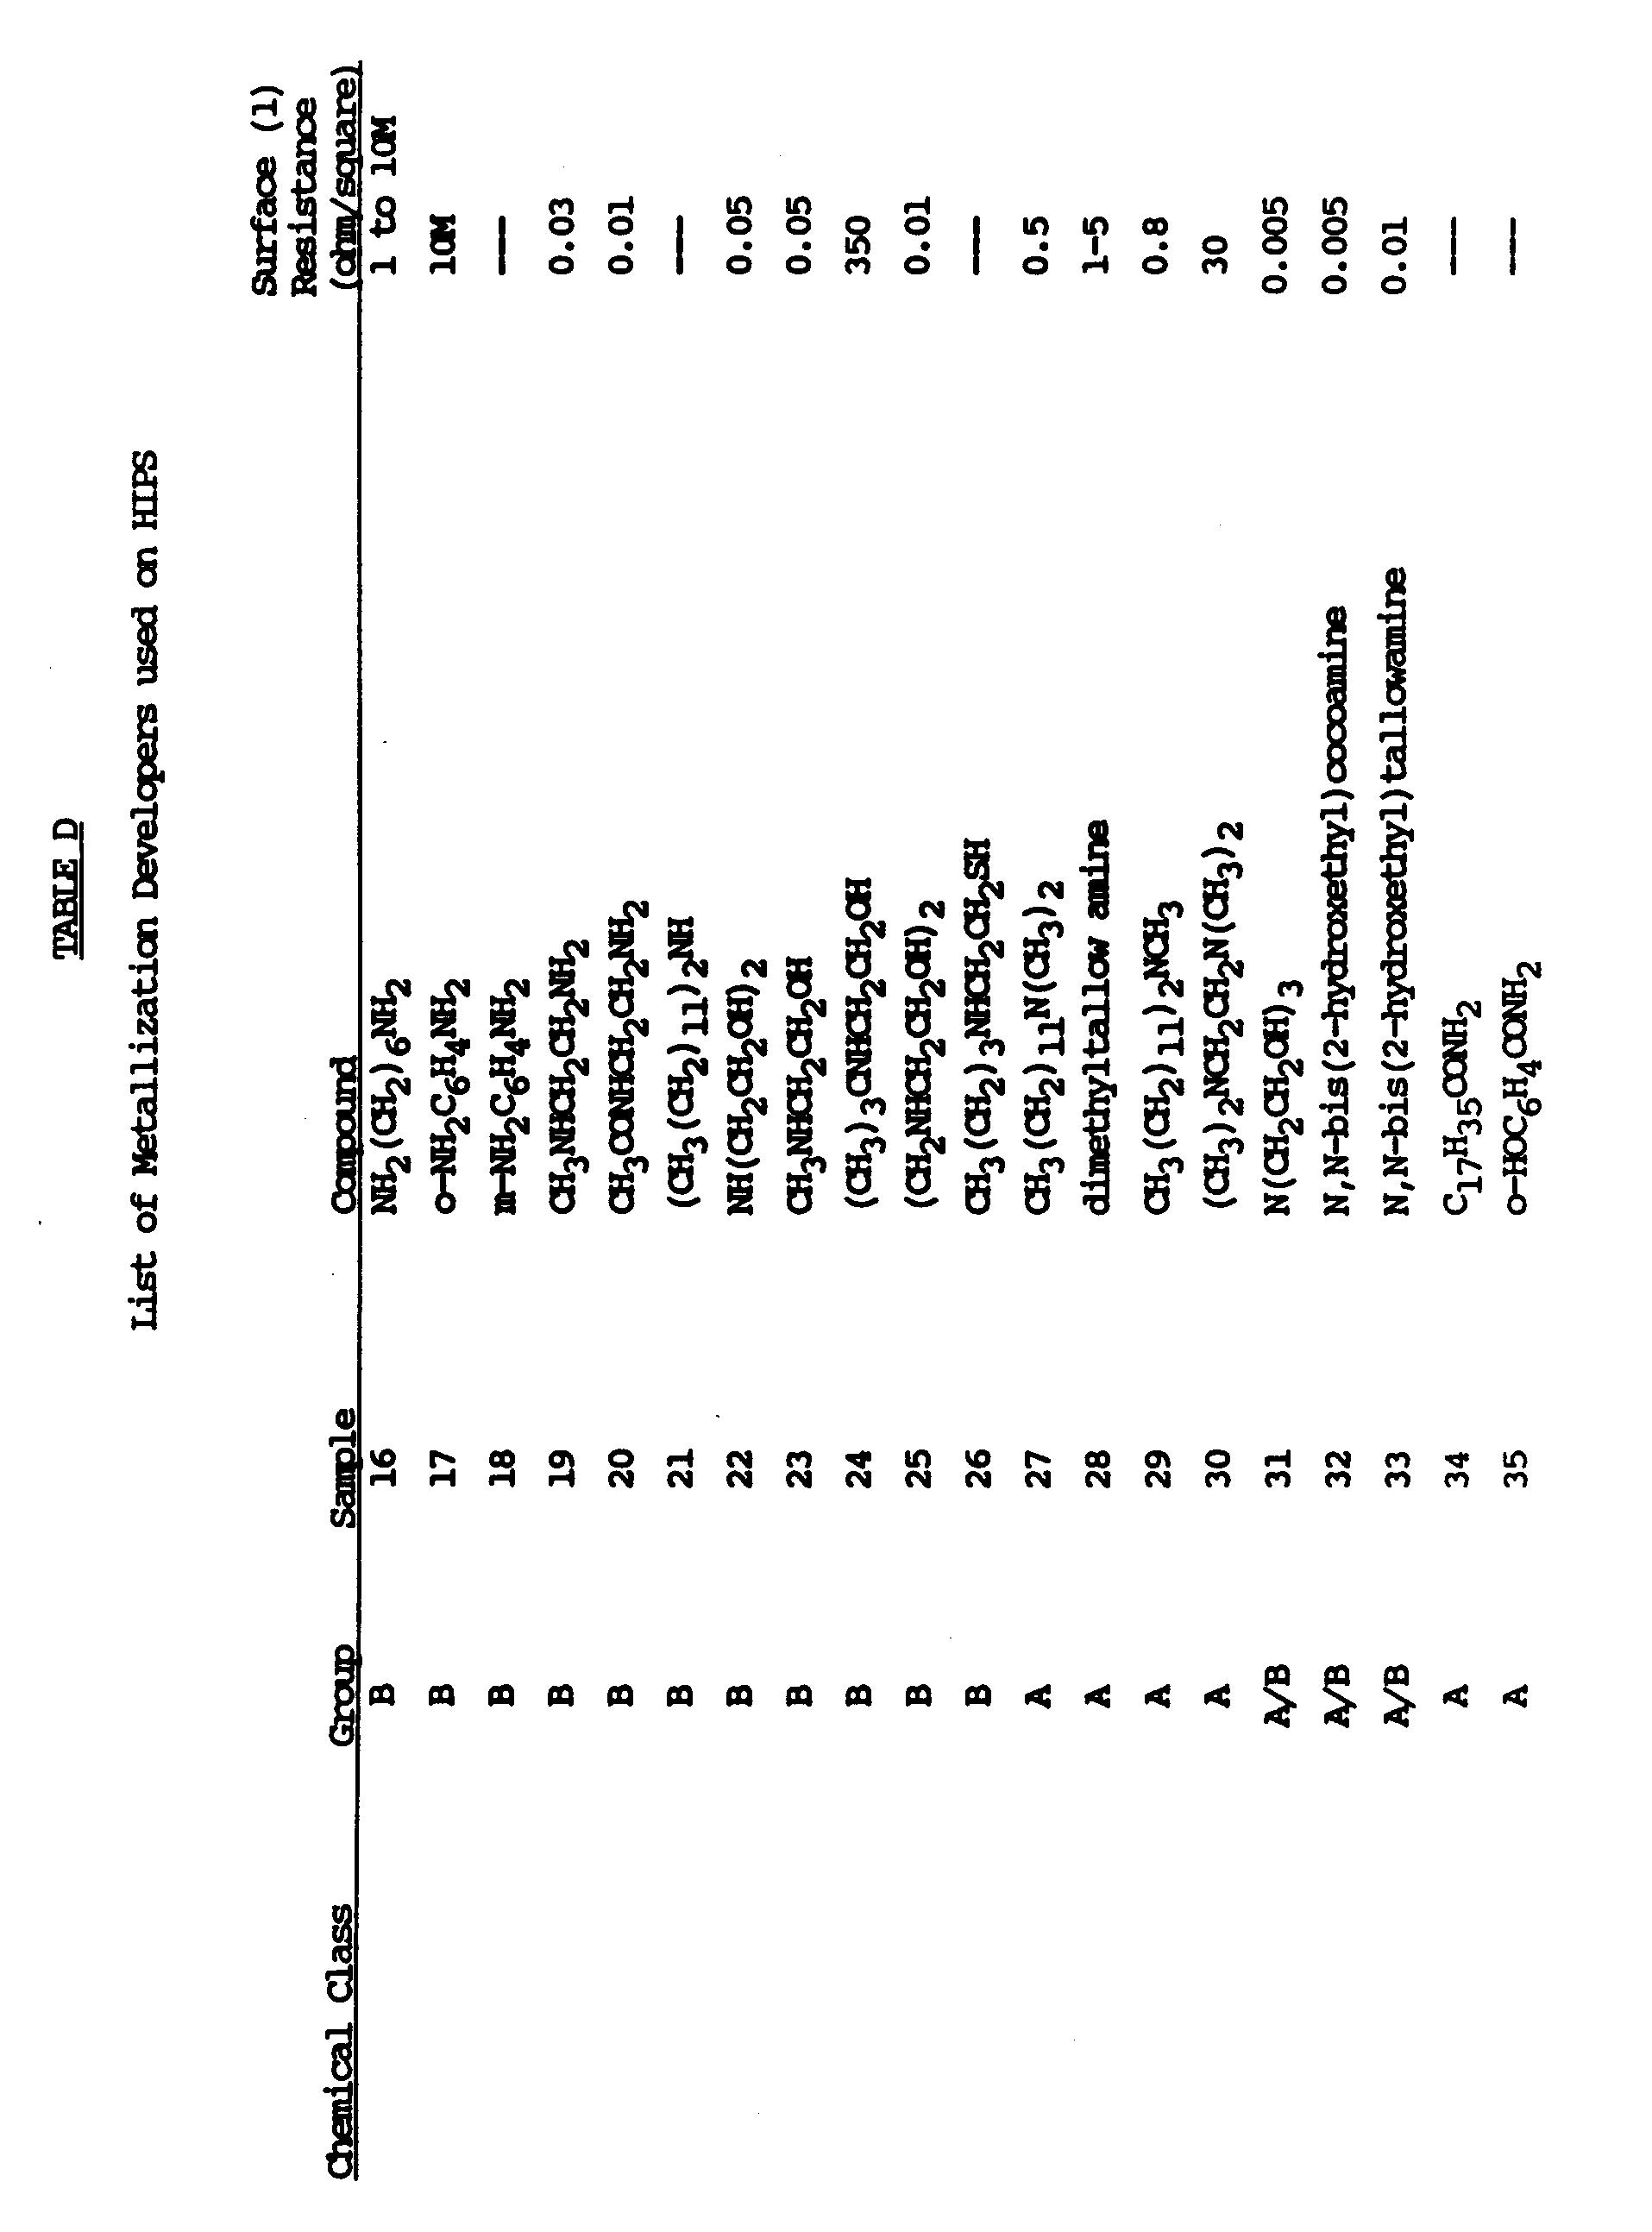 EP0297677B1 - Conductive metallization of substrates via